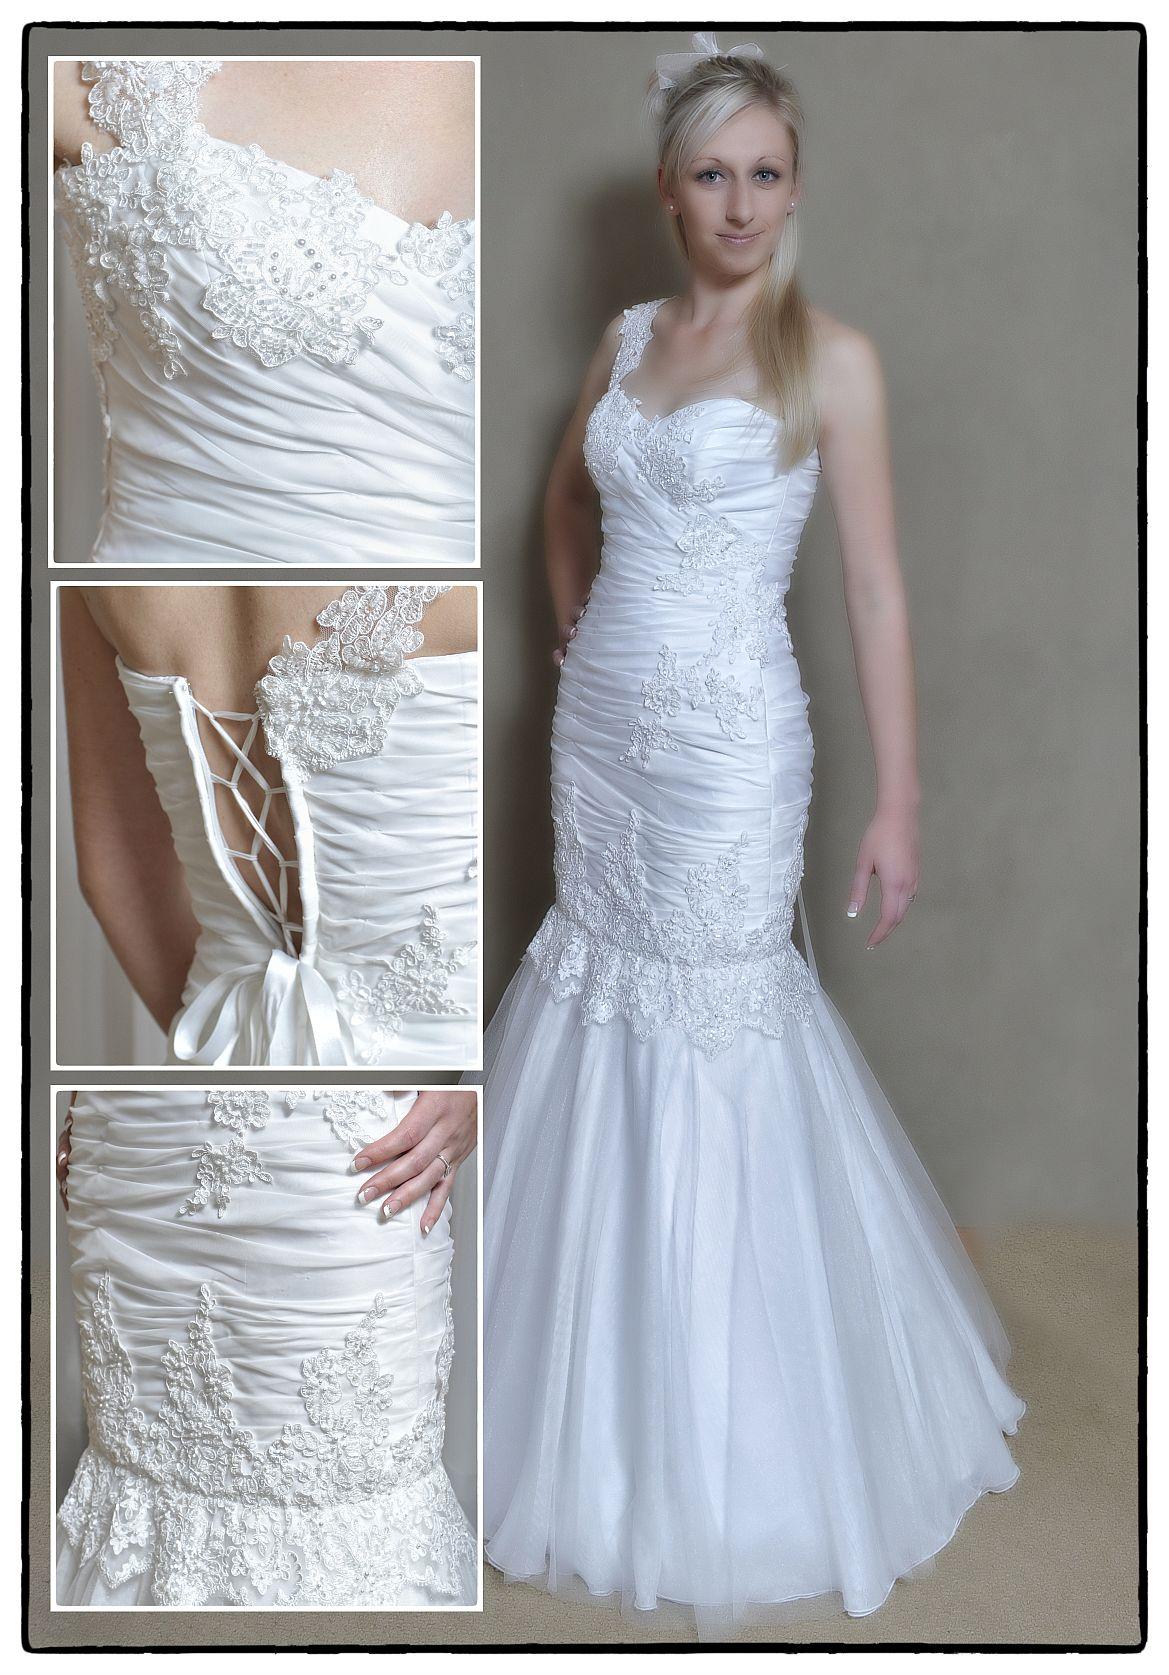 Wedding Dresses Gauteng Bridal Wear Gowns - Wedding Dresses In Redlands